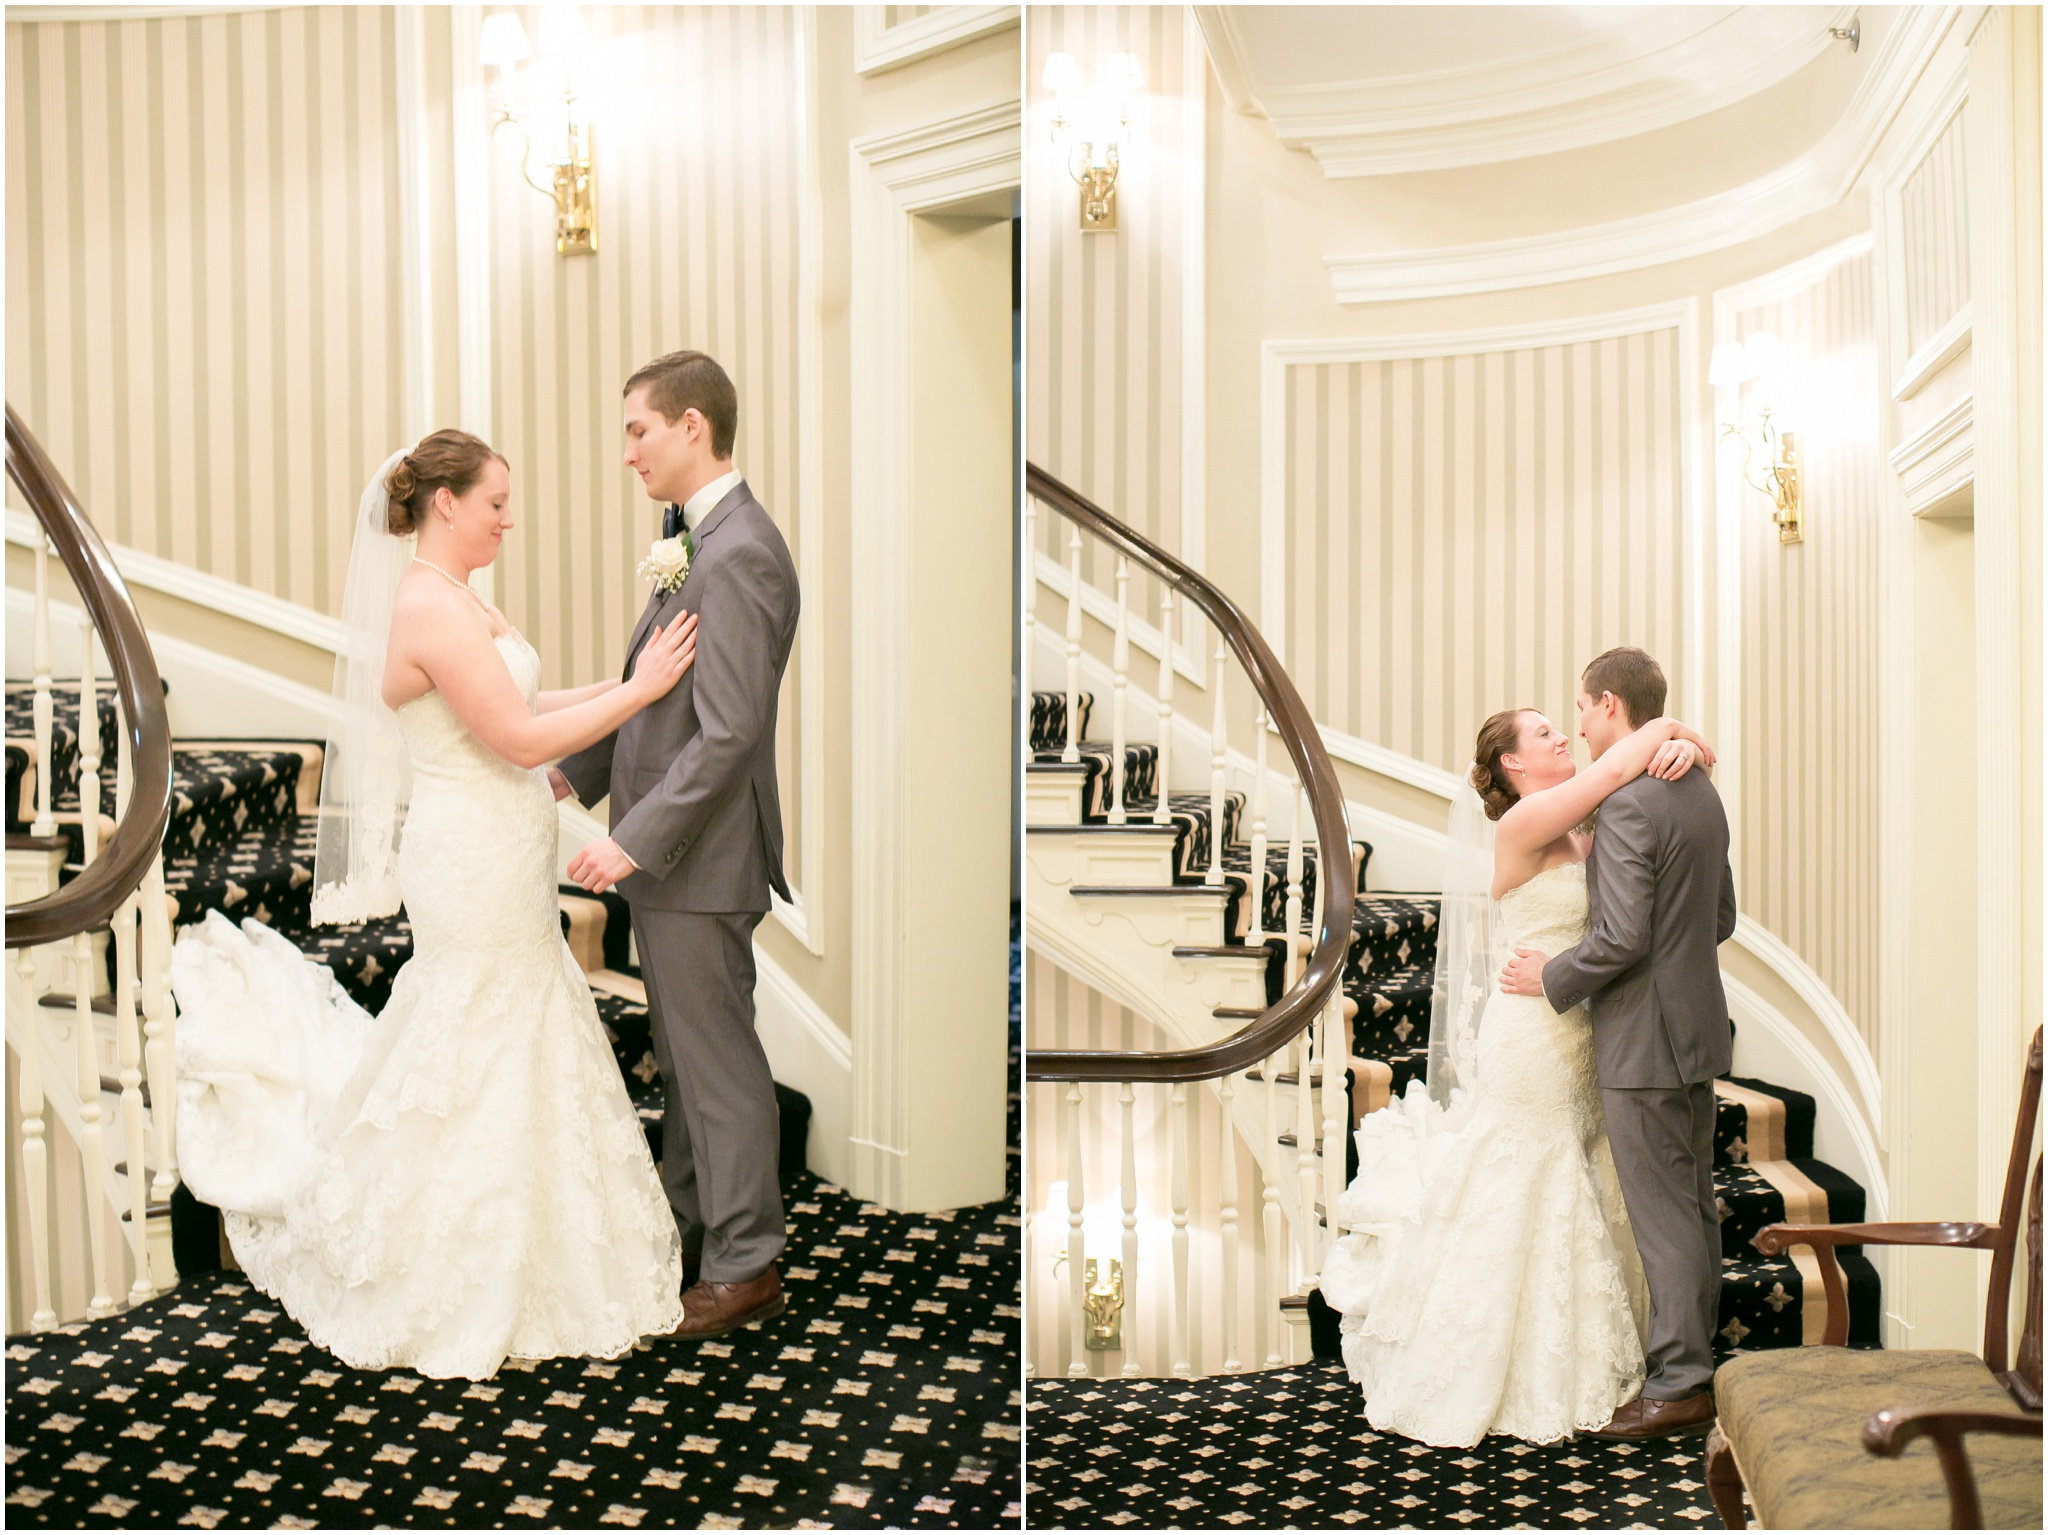 Madison_Club_Madison_Wisconsin_Wedding_Photographer_Spring_Rainy_Wedding_2597.jpg